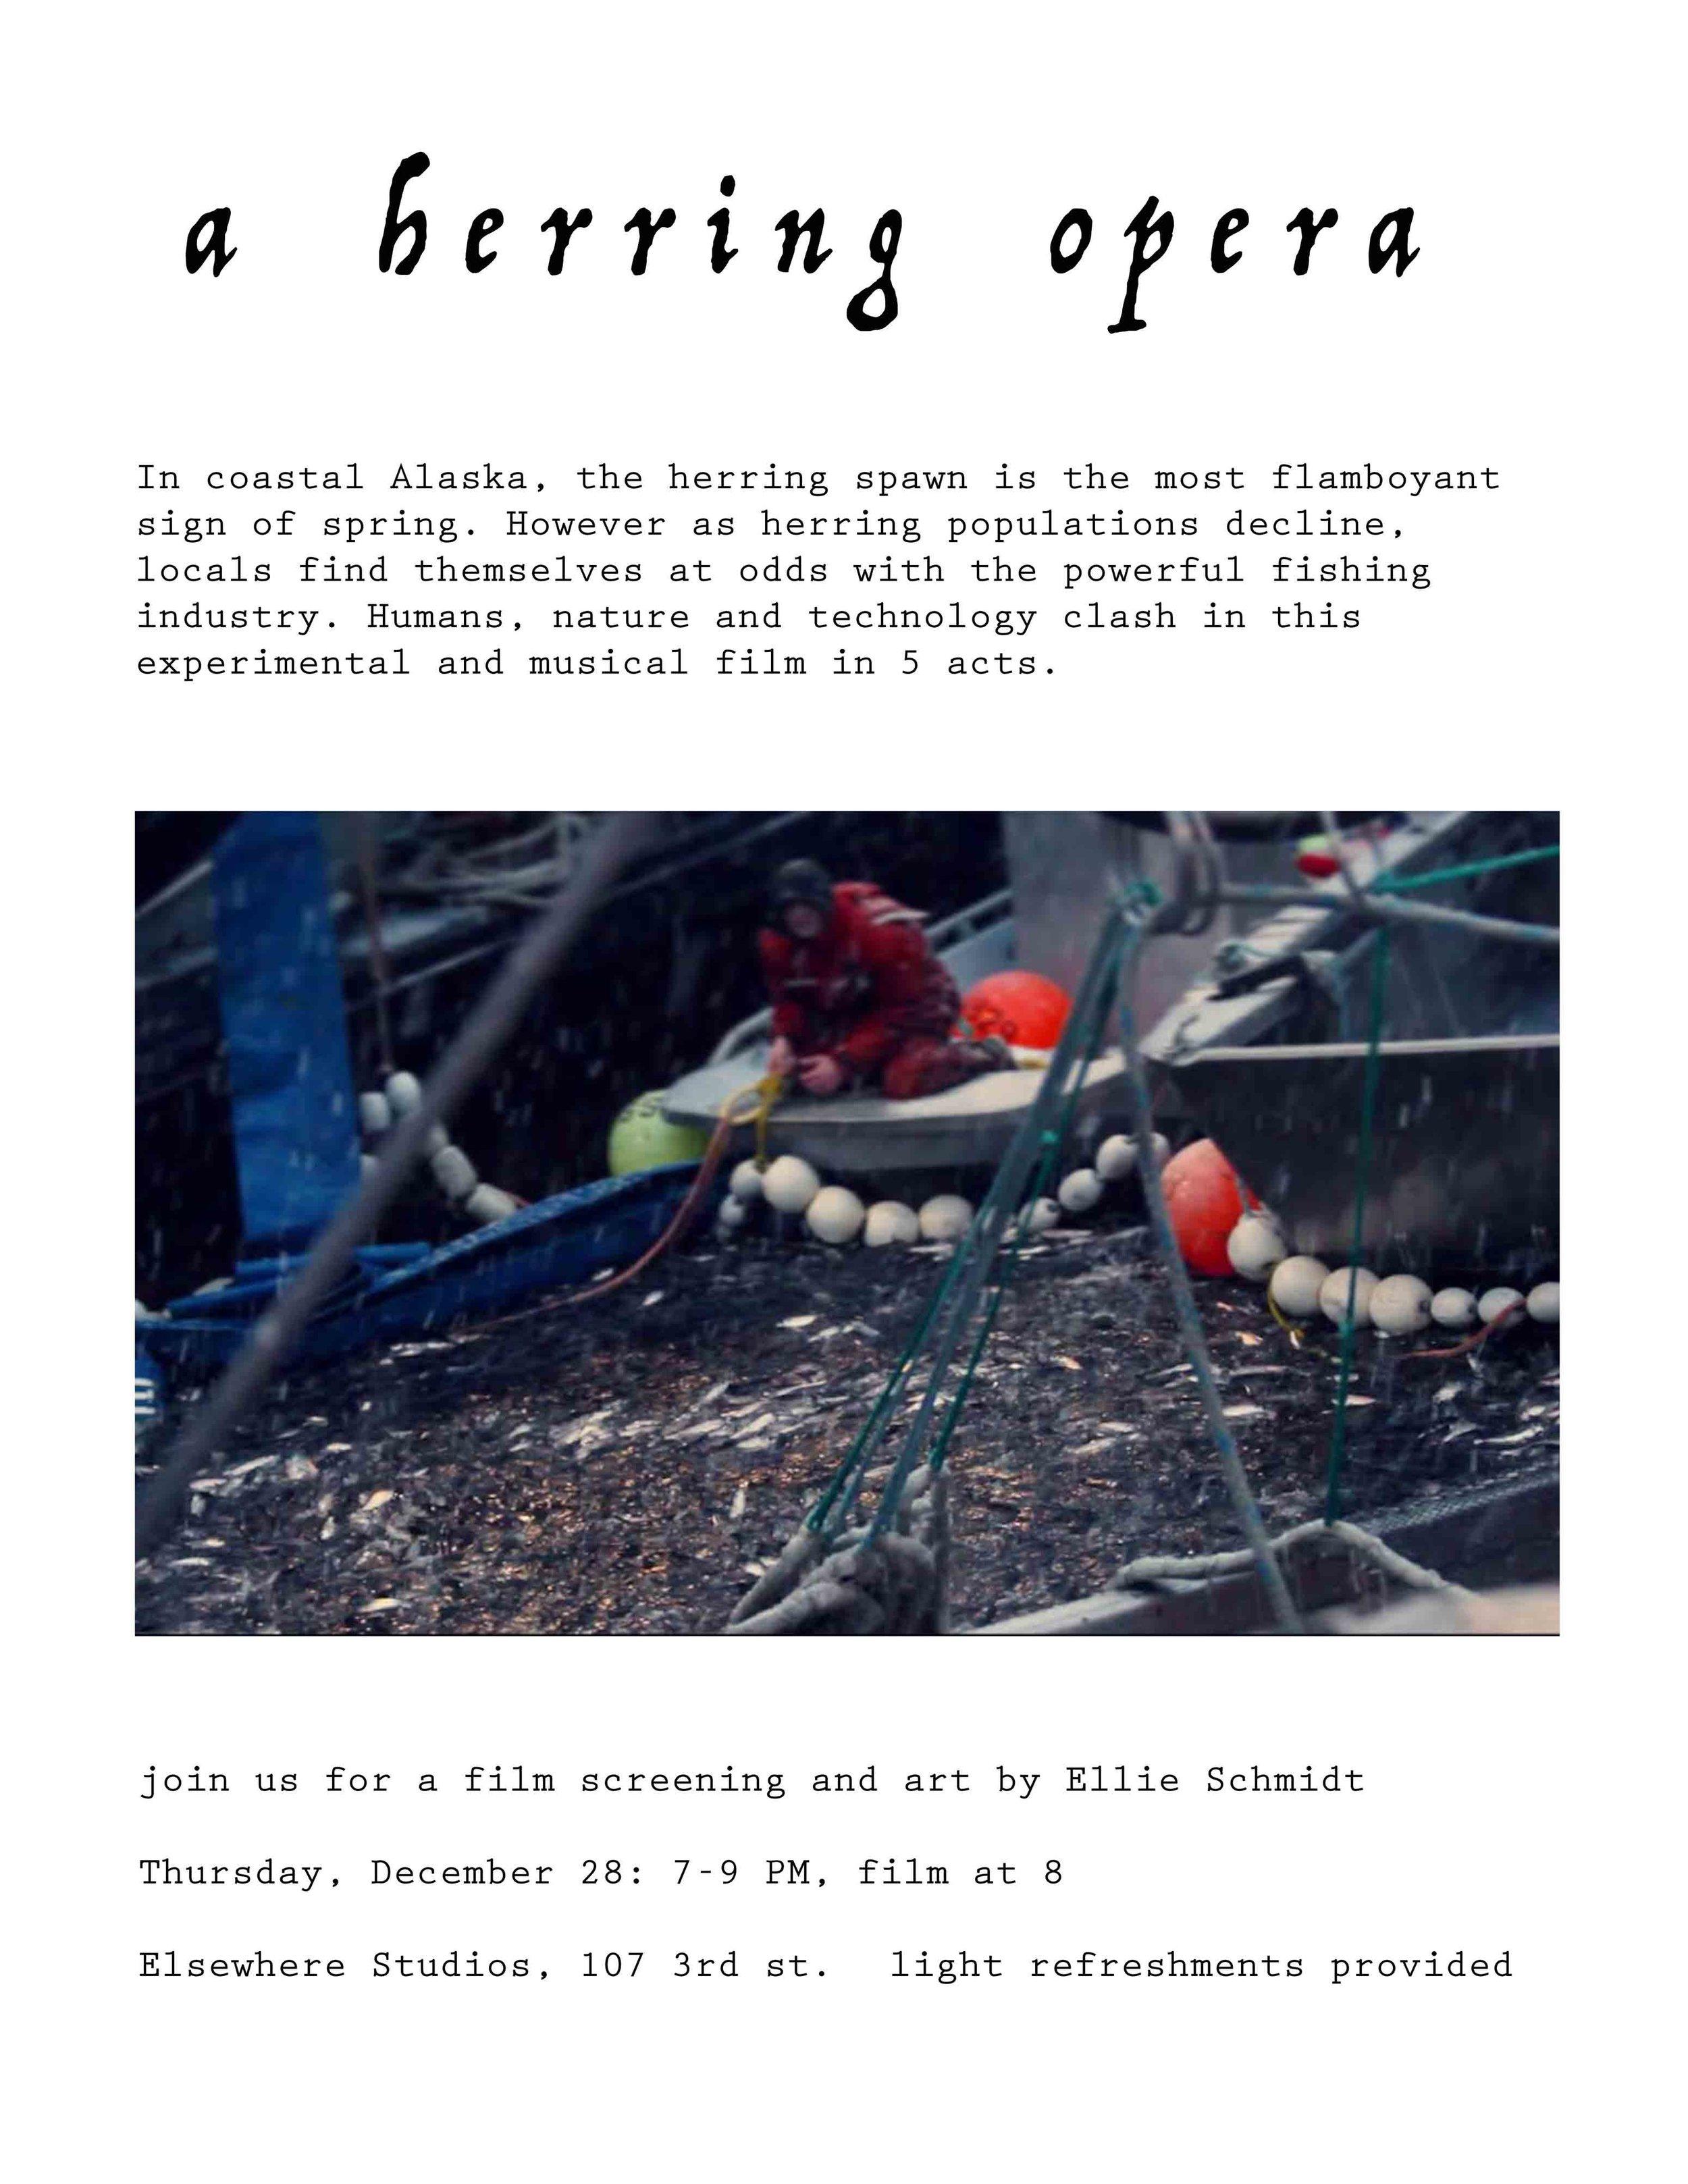 film-screening-posterweb.jpg